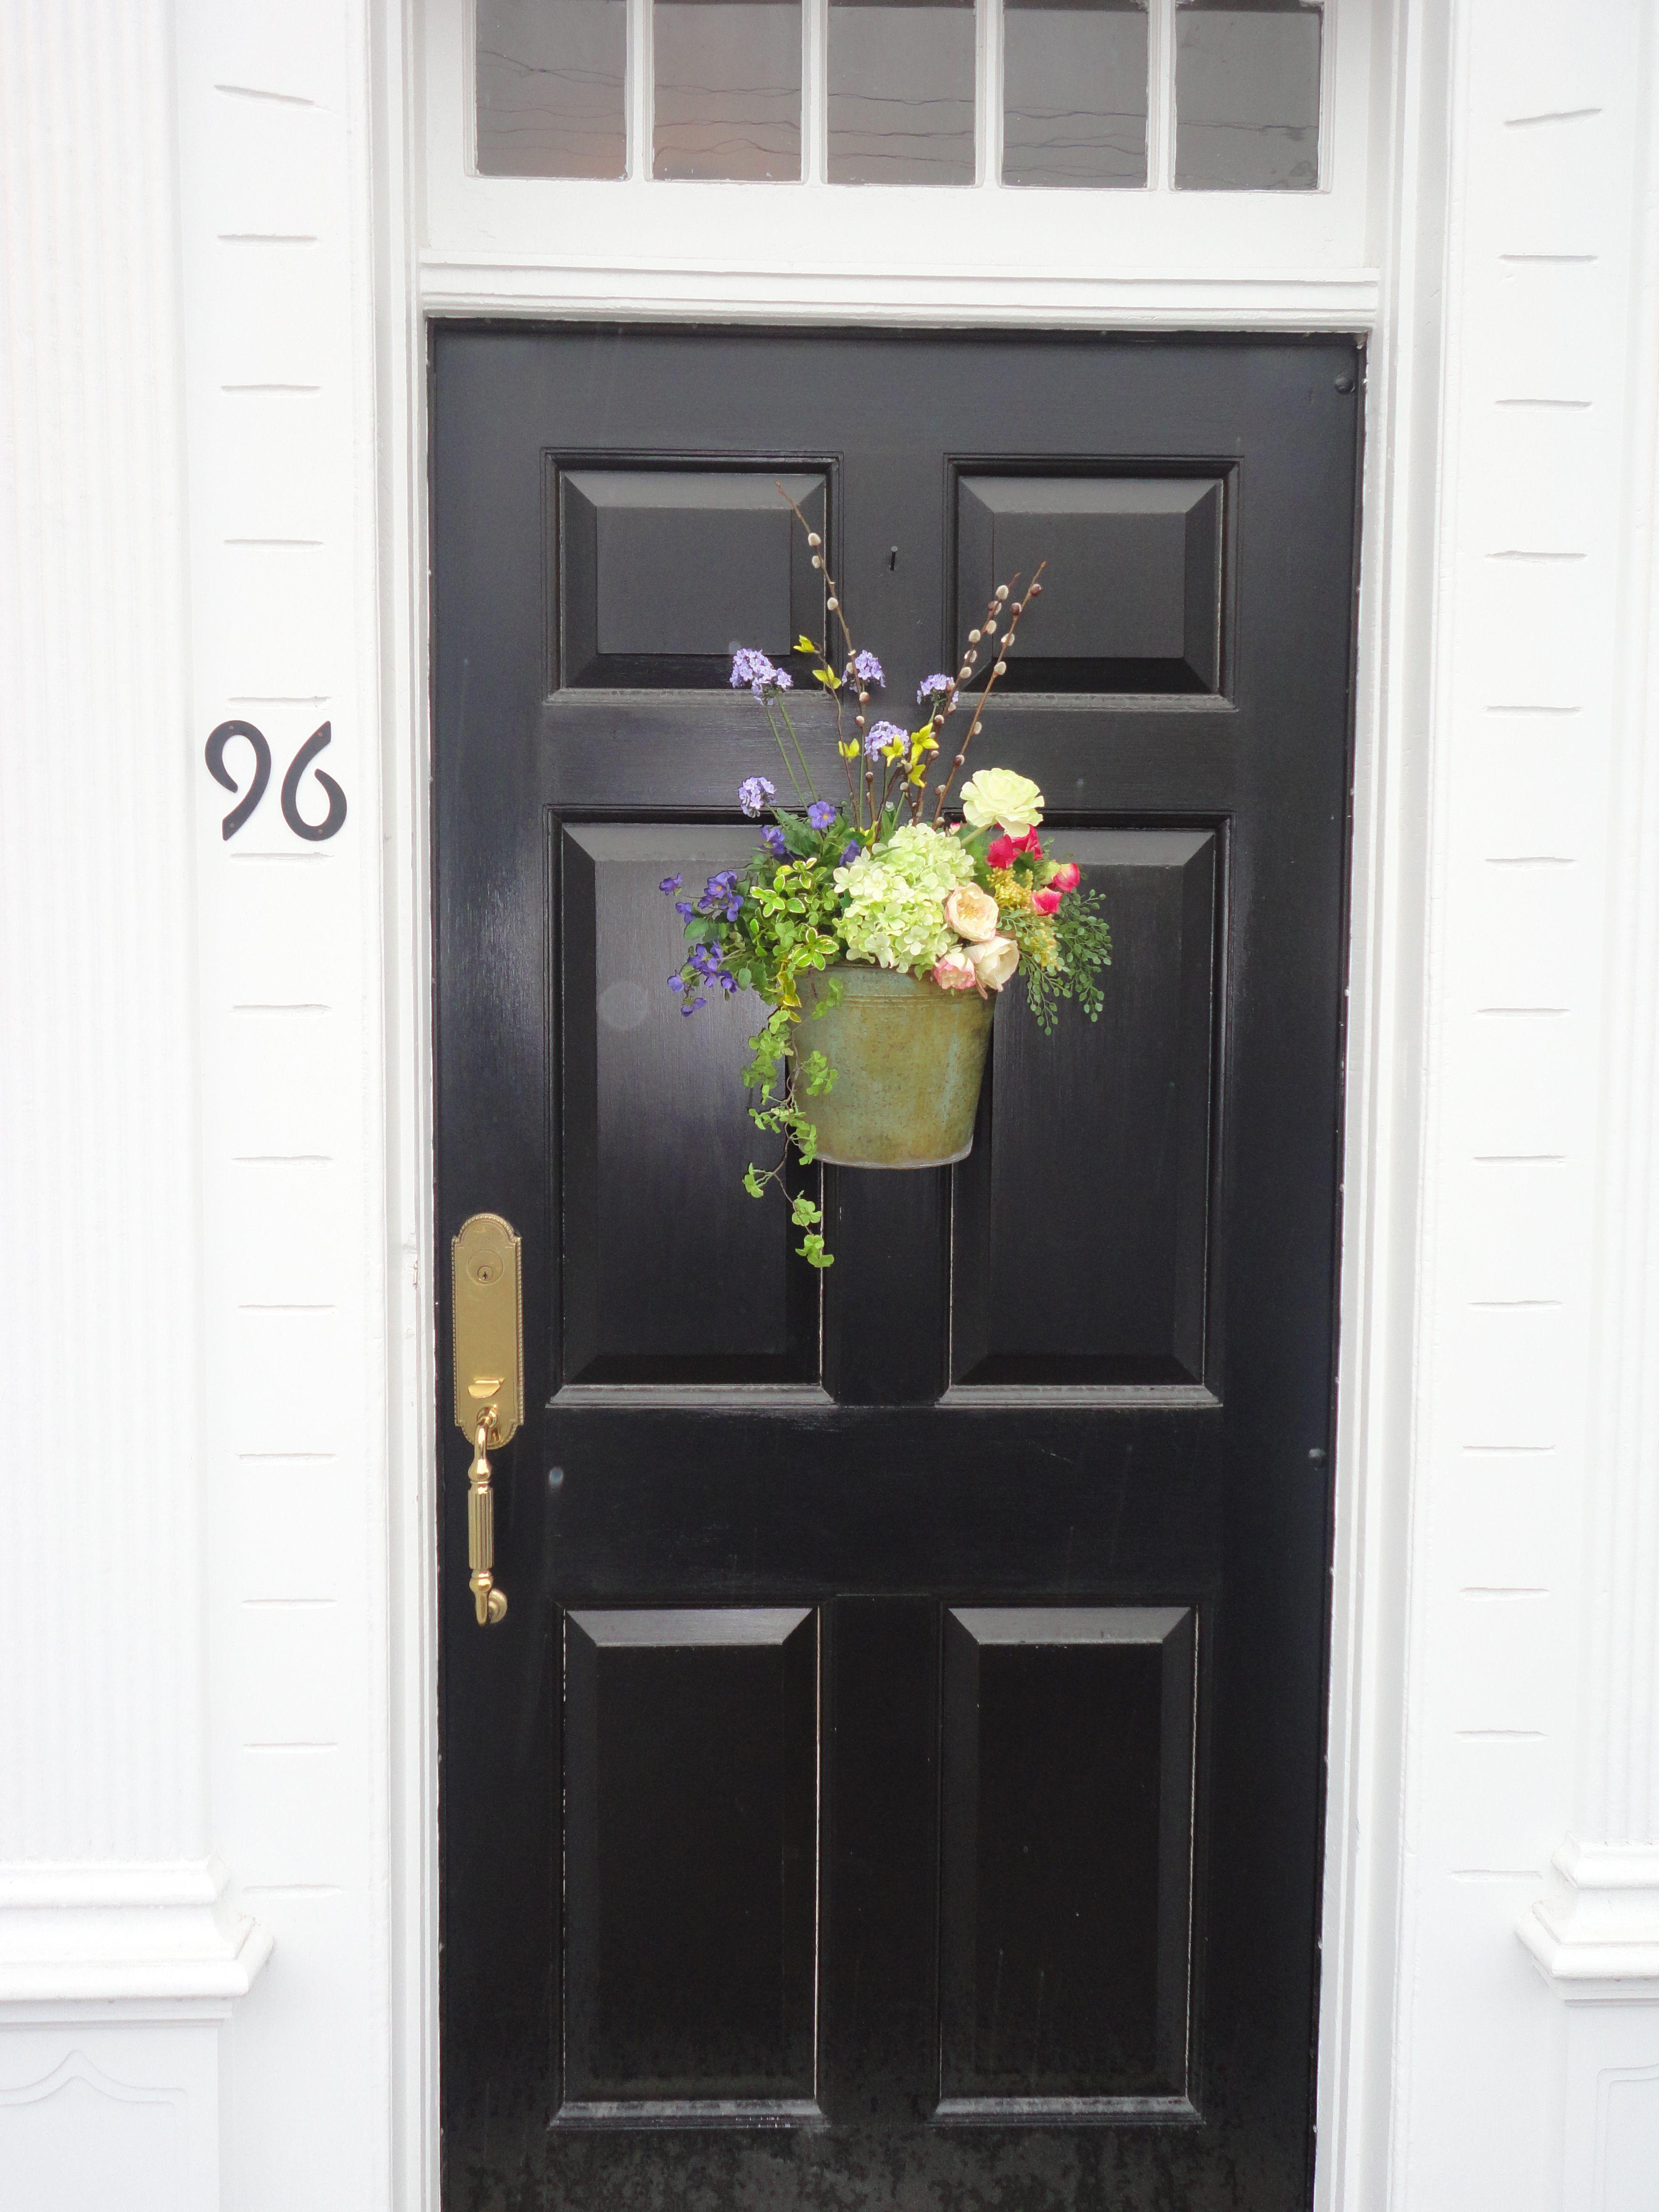 Raynard \u0026 Peirce Real Estate Company front door floral arrangement. Come visit us. 96 & Raynard \u0026 Peirce Real Estate Company front door floral arrangement ...